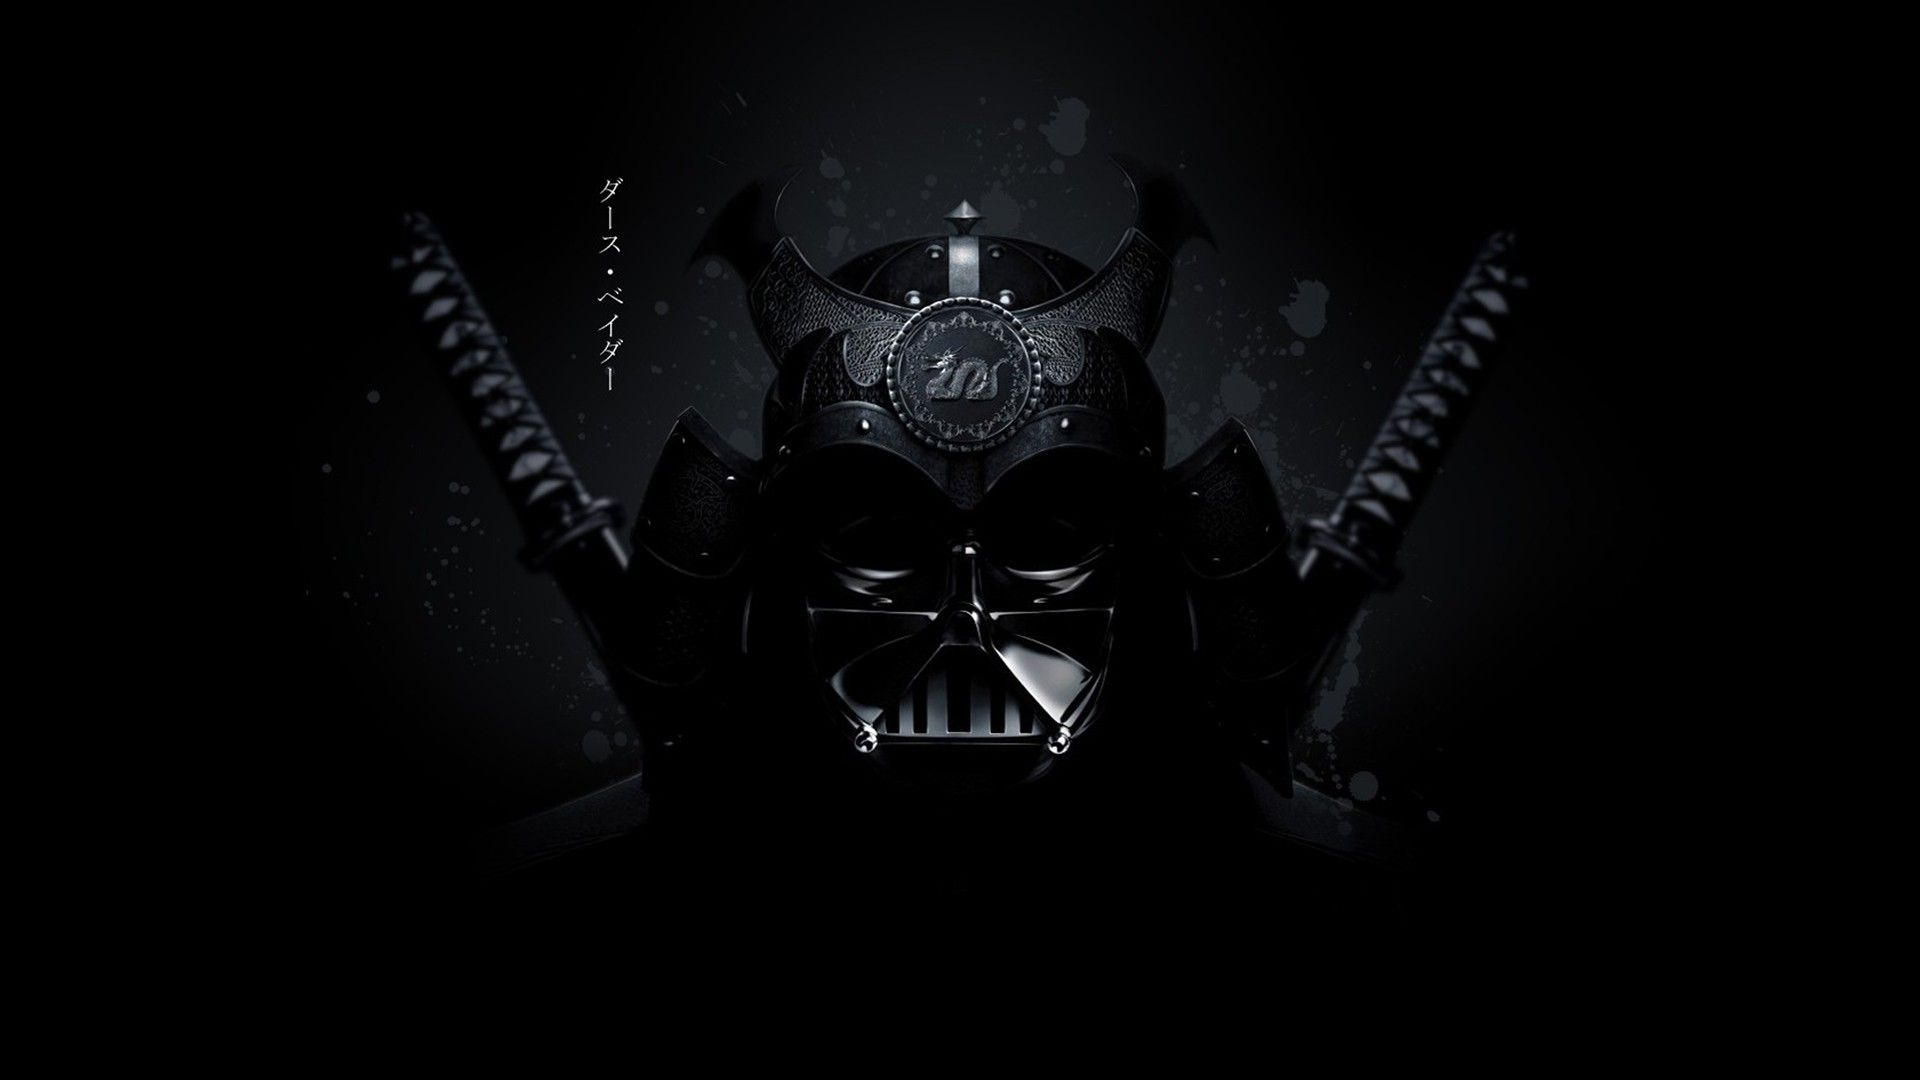 Star Wars Black Wallpapers Top Free Star Wars Black Backgrounds